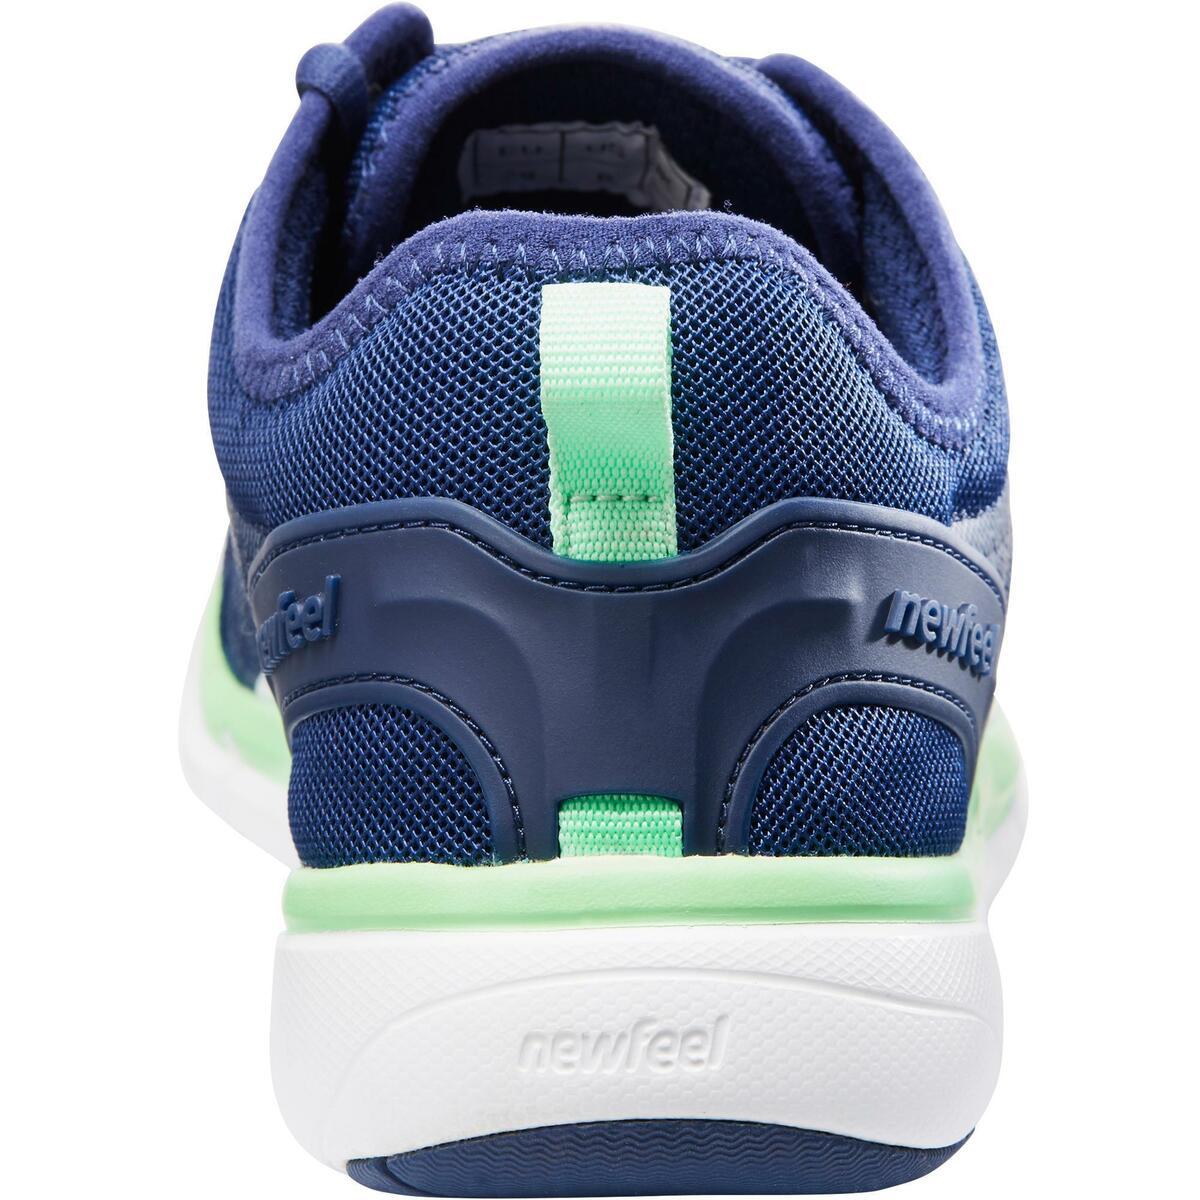 Bild 5 von Walkingschuhe Soft 540 Mesh Damen marineblau/grün